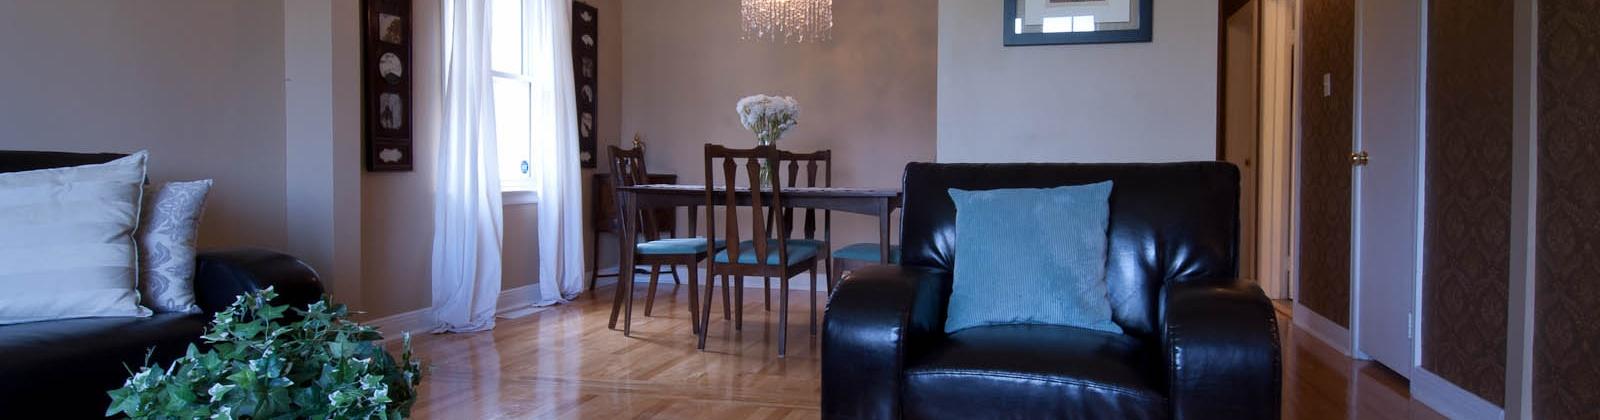 This property is SOLD.,2 Bedrooms Bedrooms,2 BathroomsBathrooms,Detached,Beaudry Street,1015